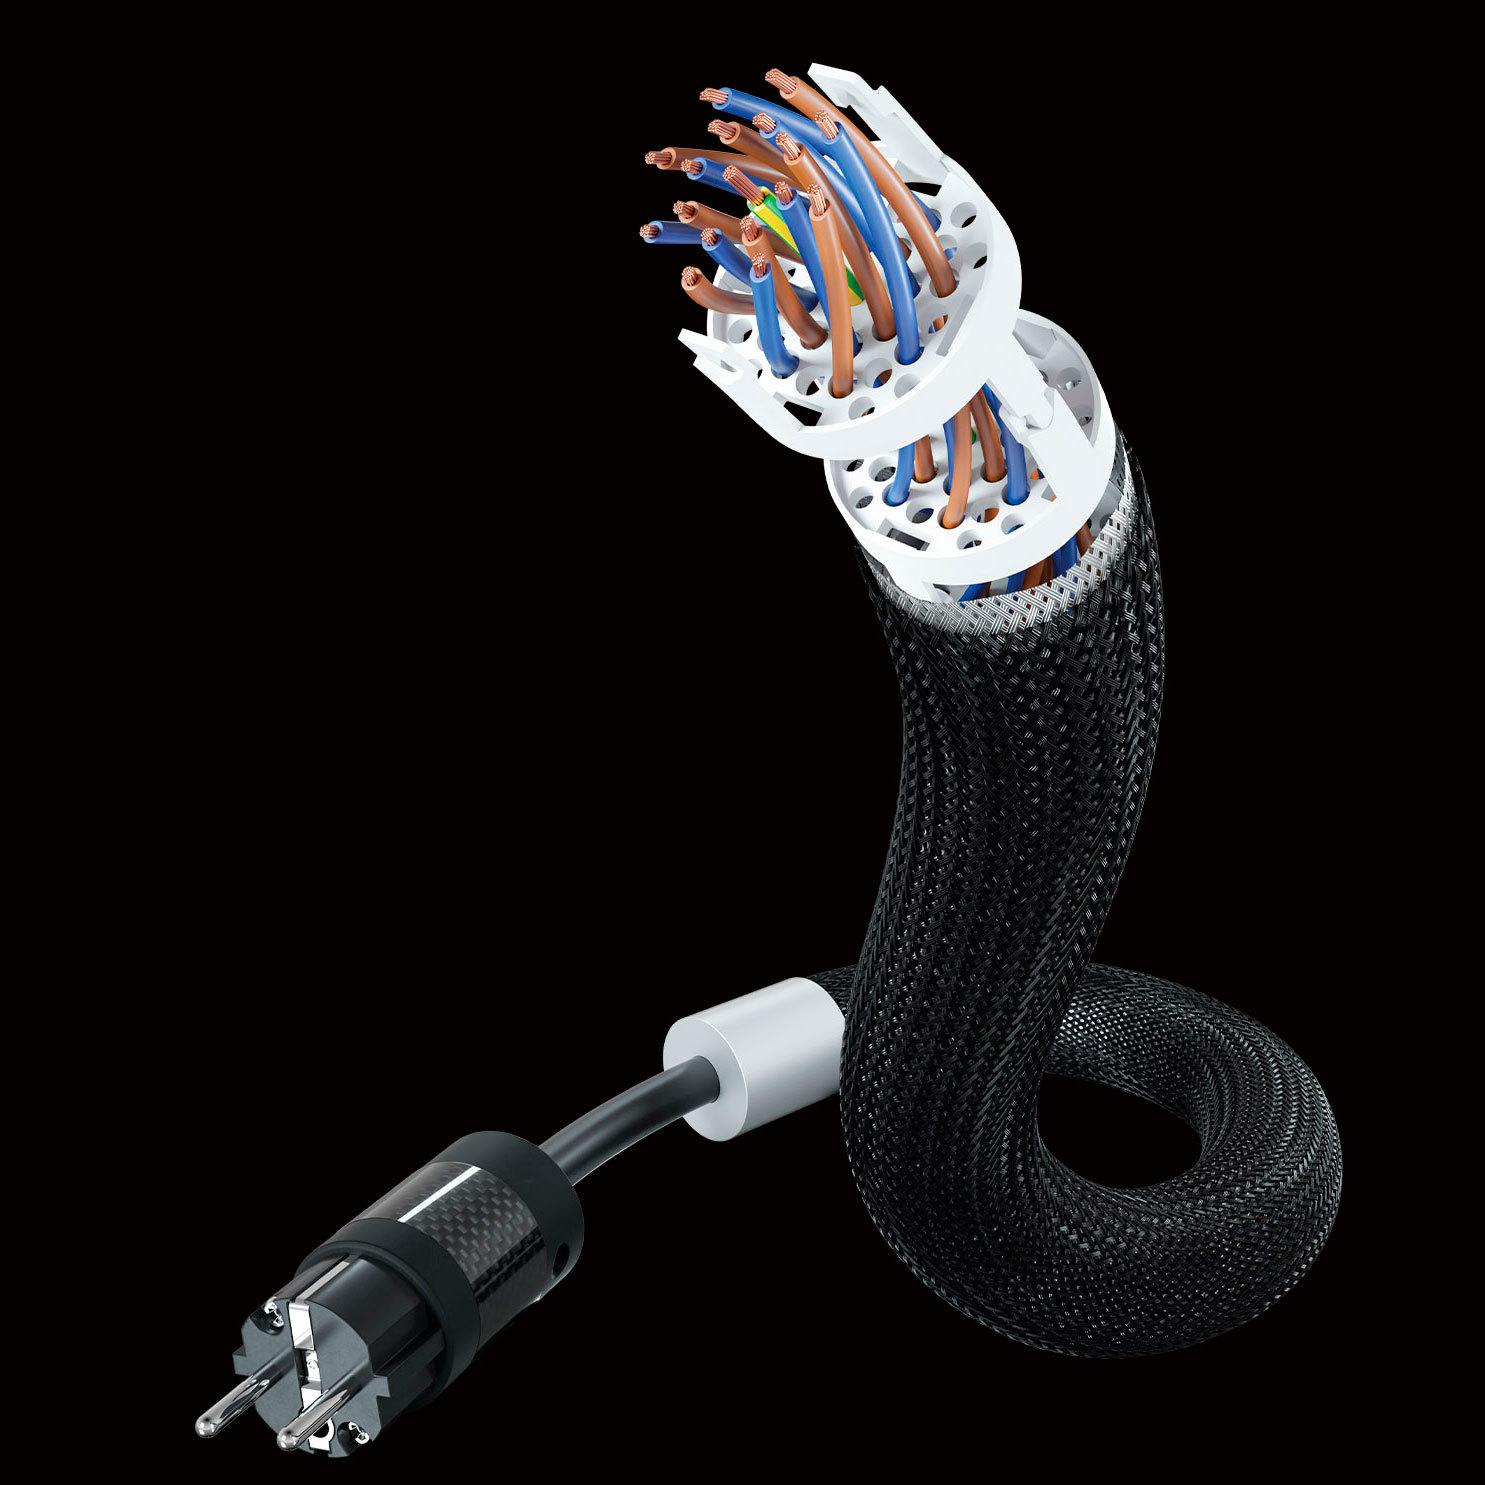 Inakustik Referenz Mains Cable, AC-4404 AIR, SHUKO